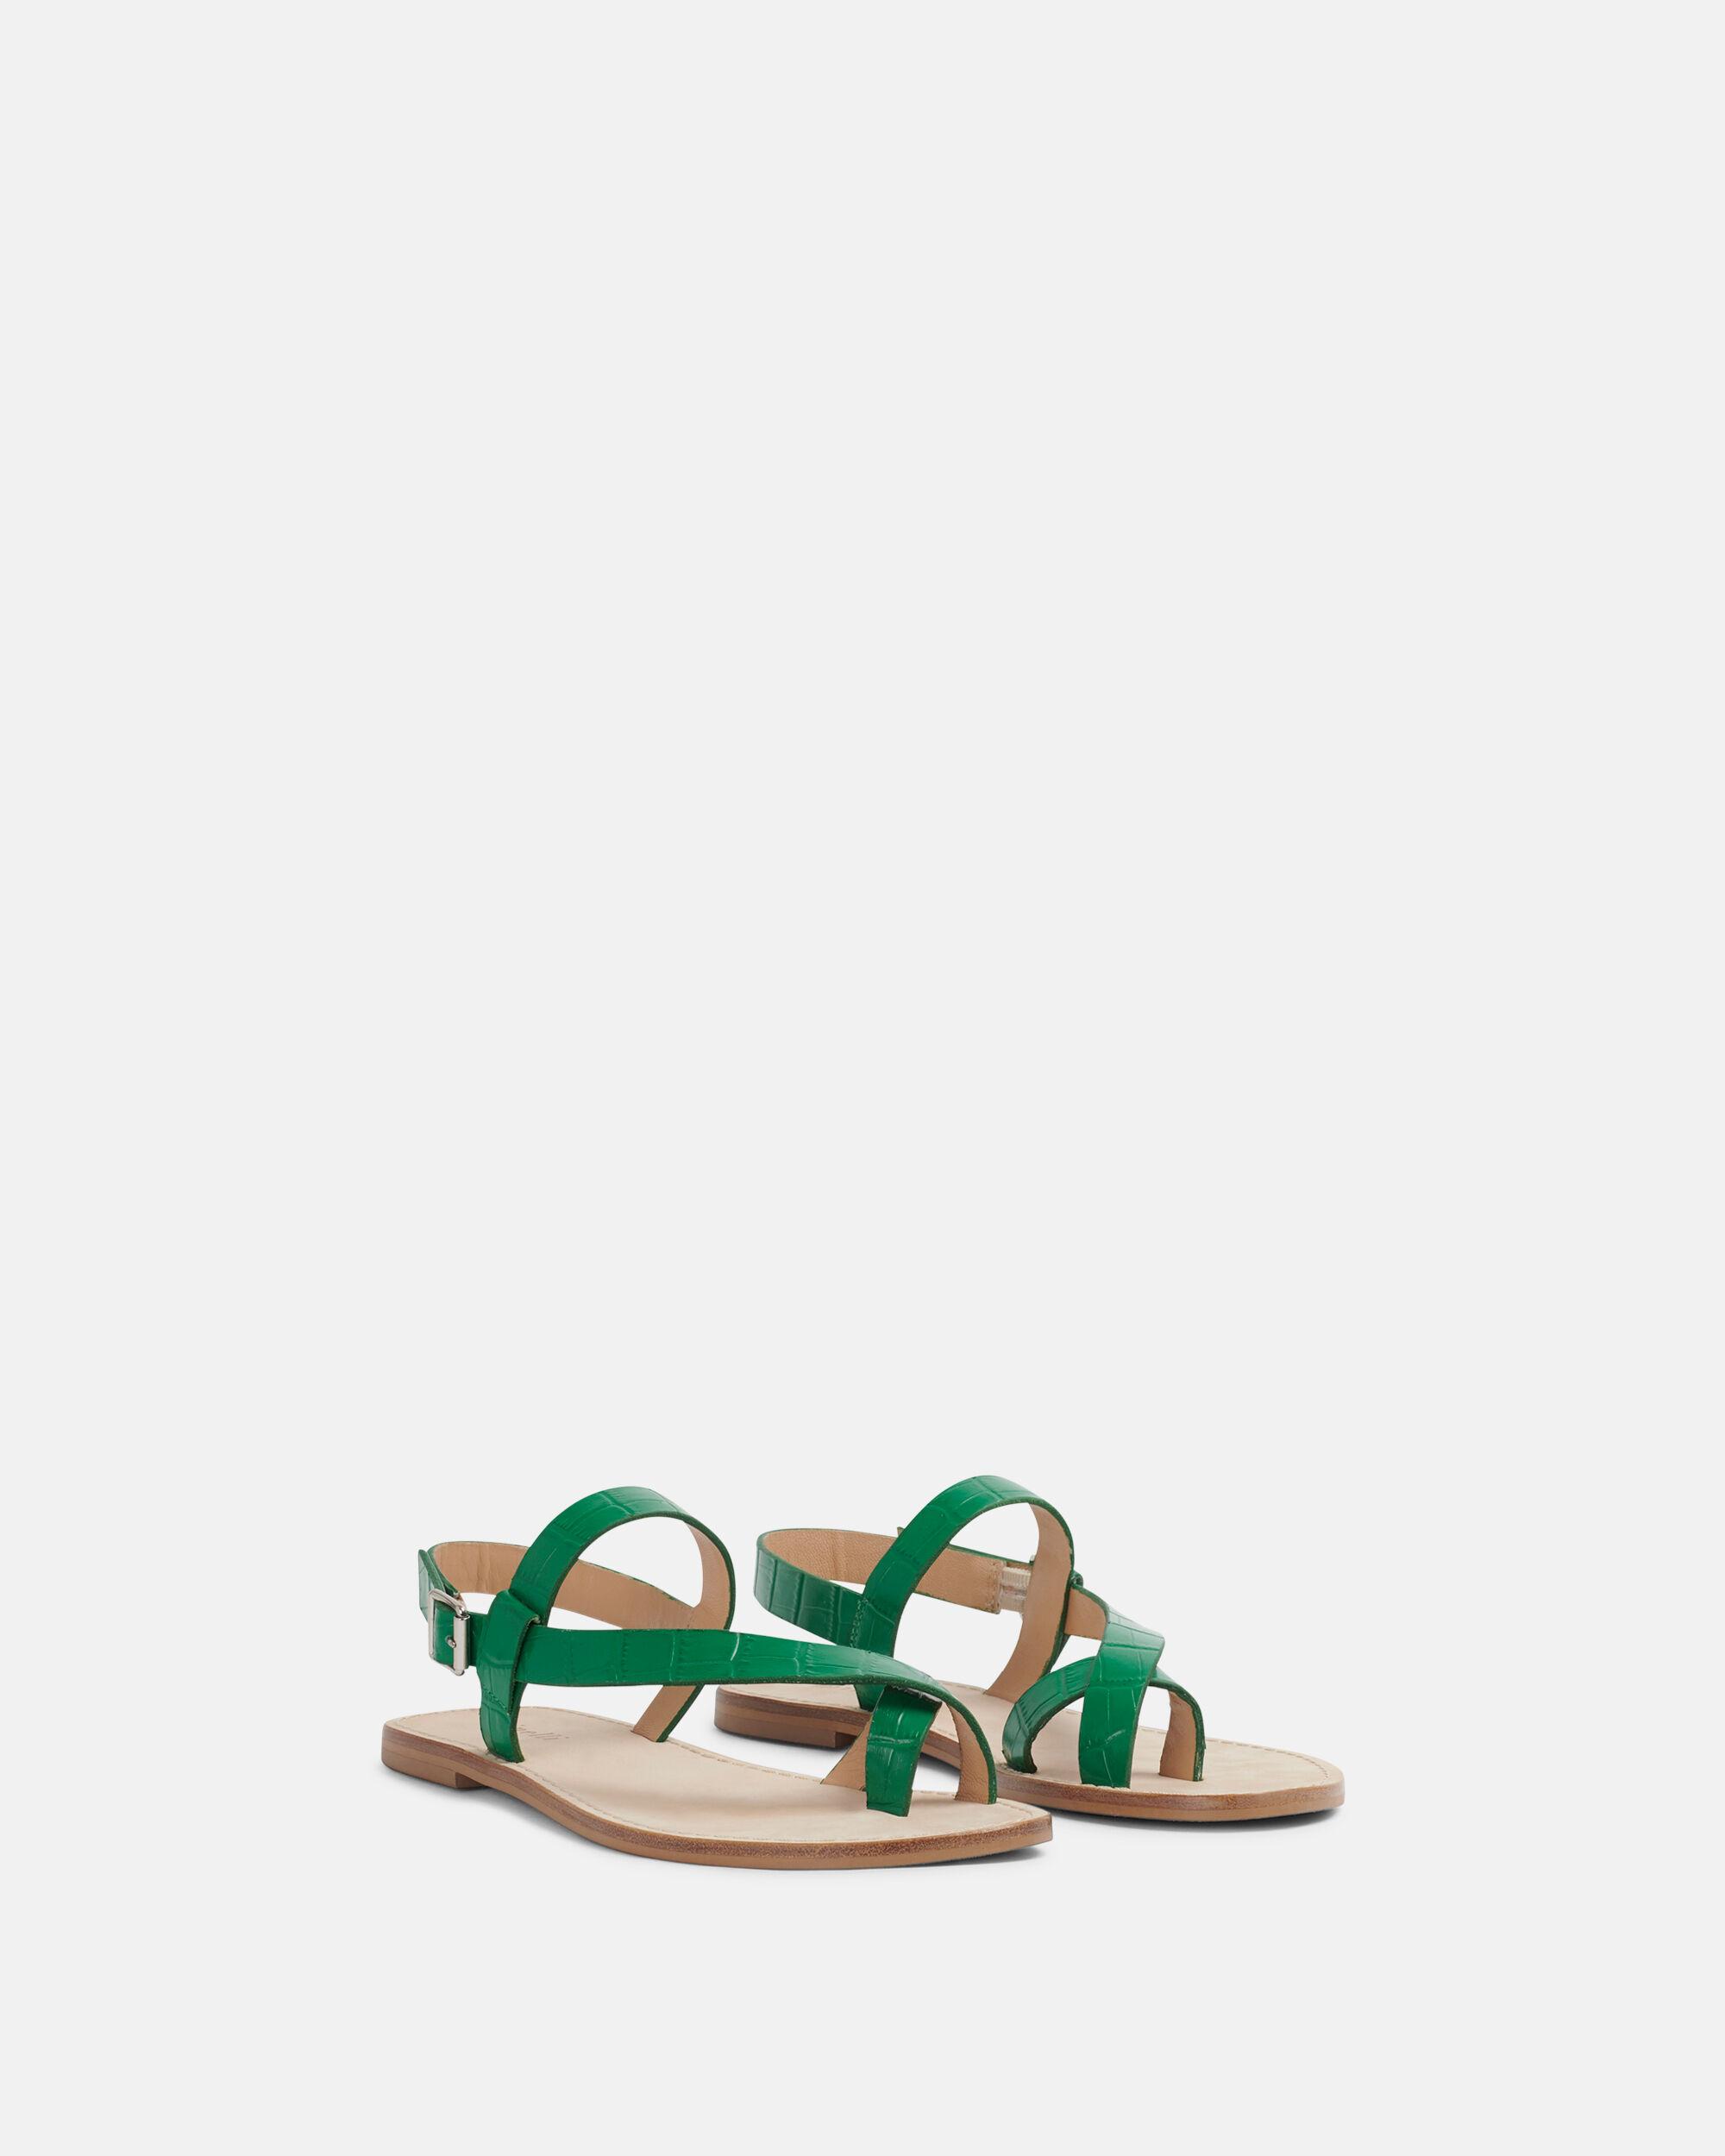 Cuir Meryne Chevre Sandales Sandale Plate Plates 8Pk0XOnw